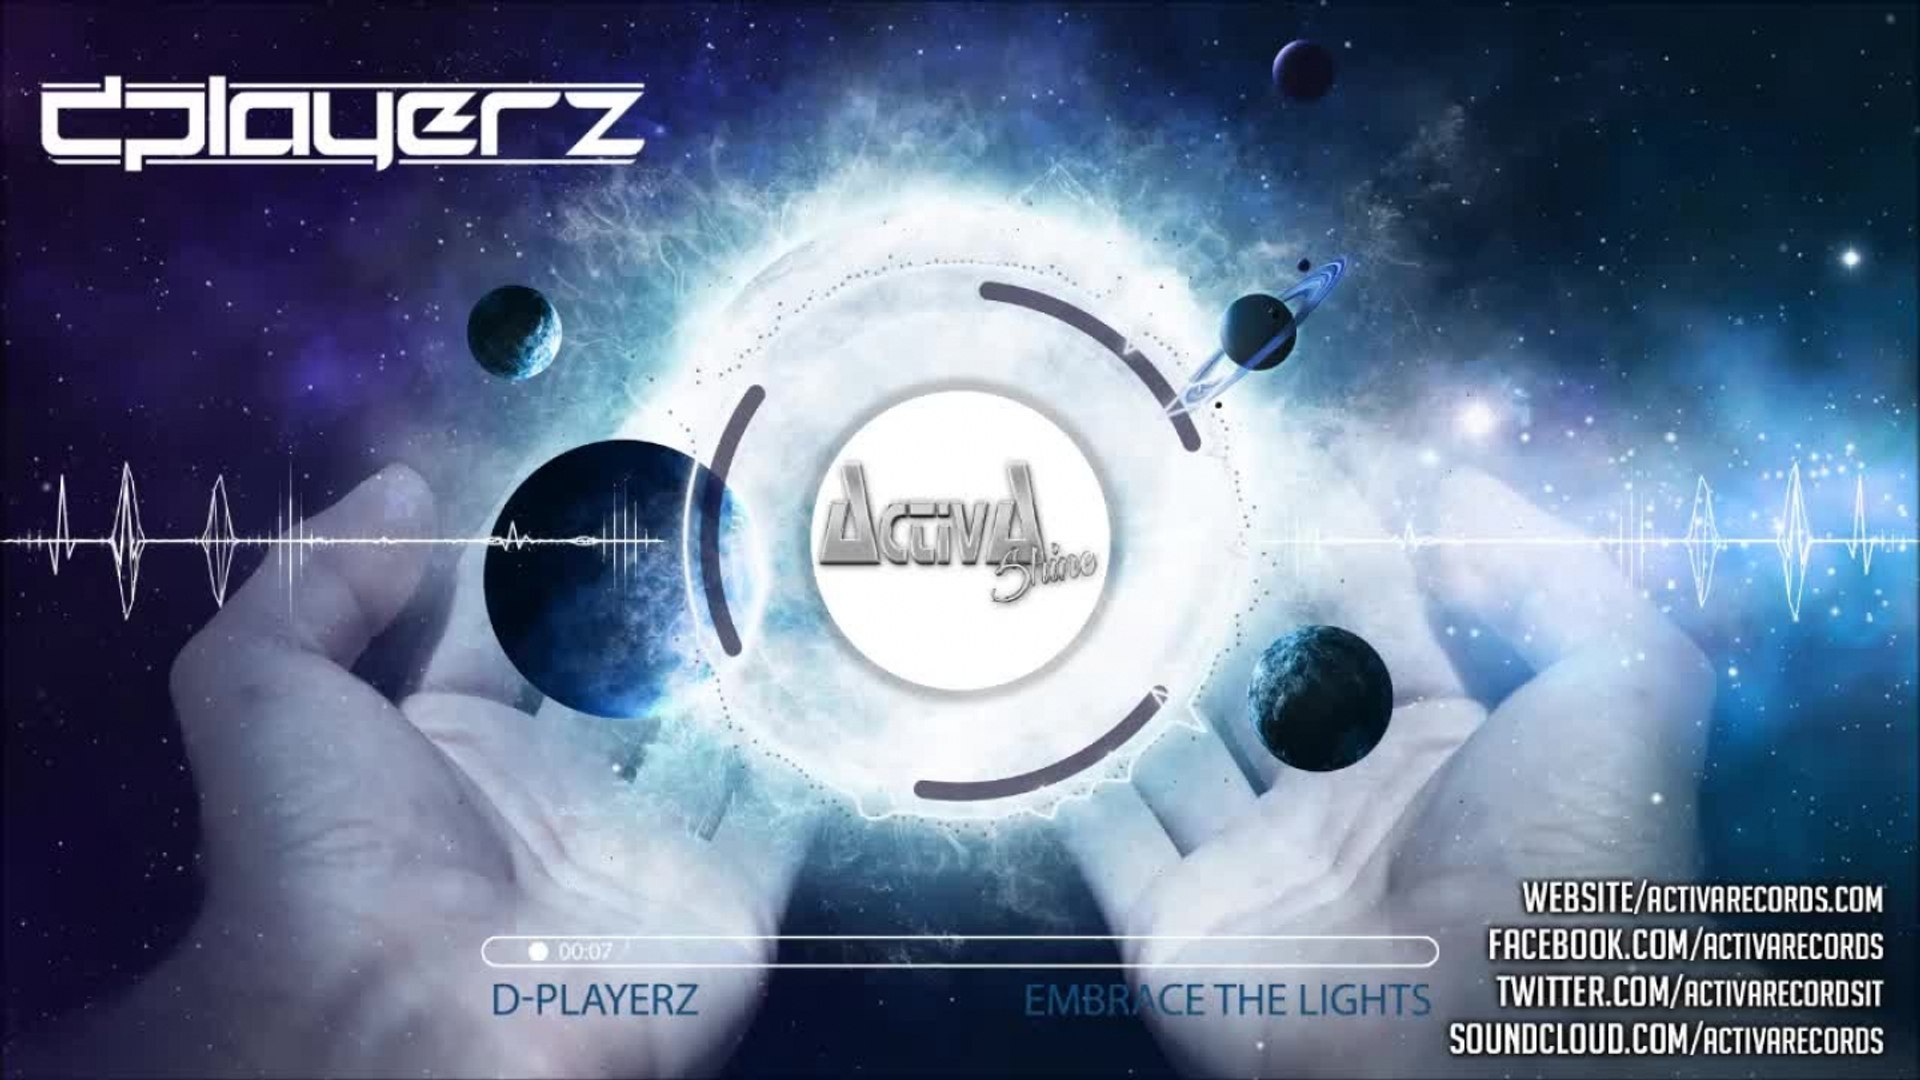 D-Playerz - Embrace The Lights (Original Mix) - Official Preview (Activa Shine)